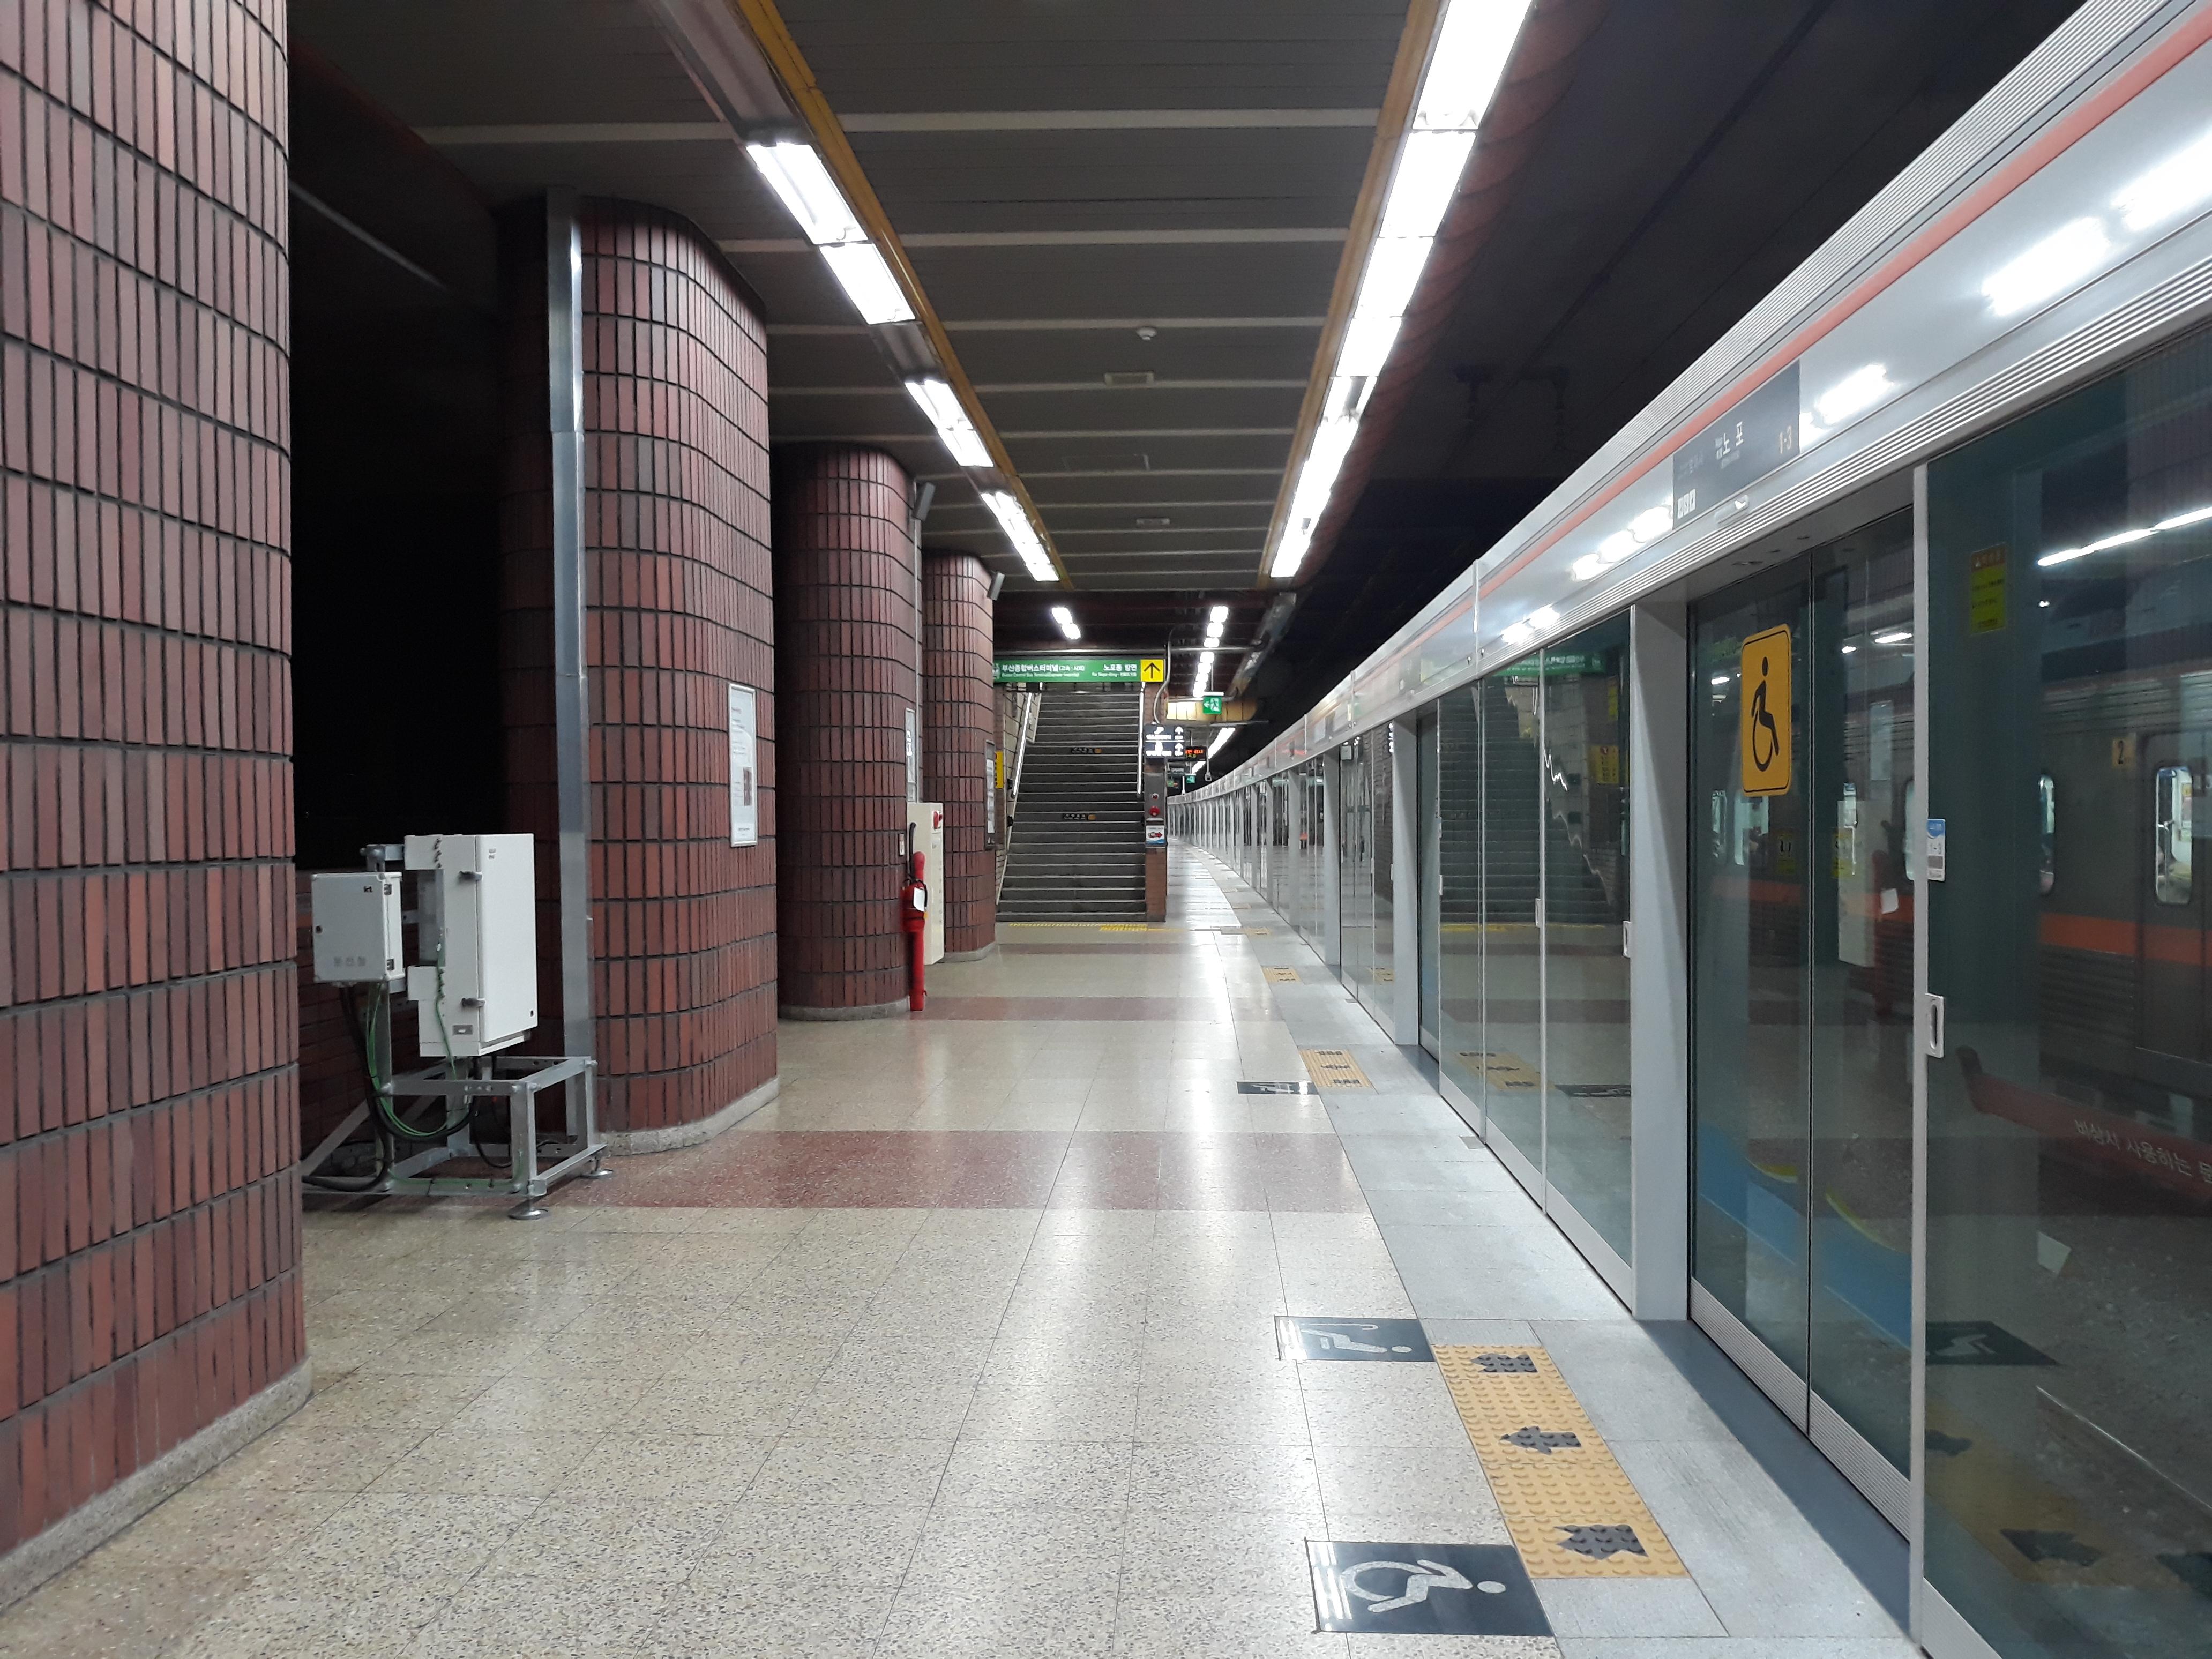 Nopo station platform 20180227 214430.jpg